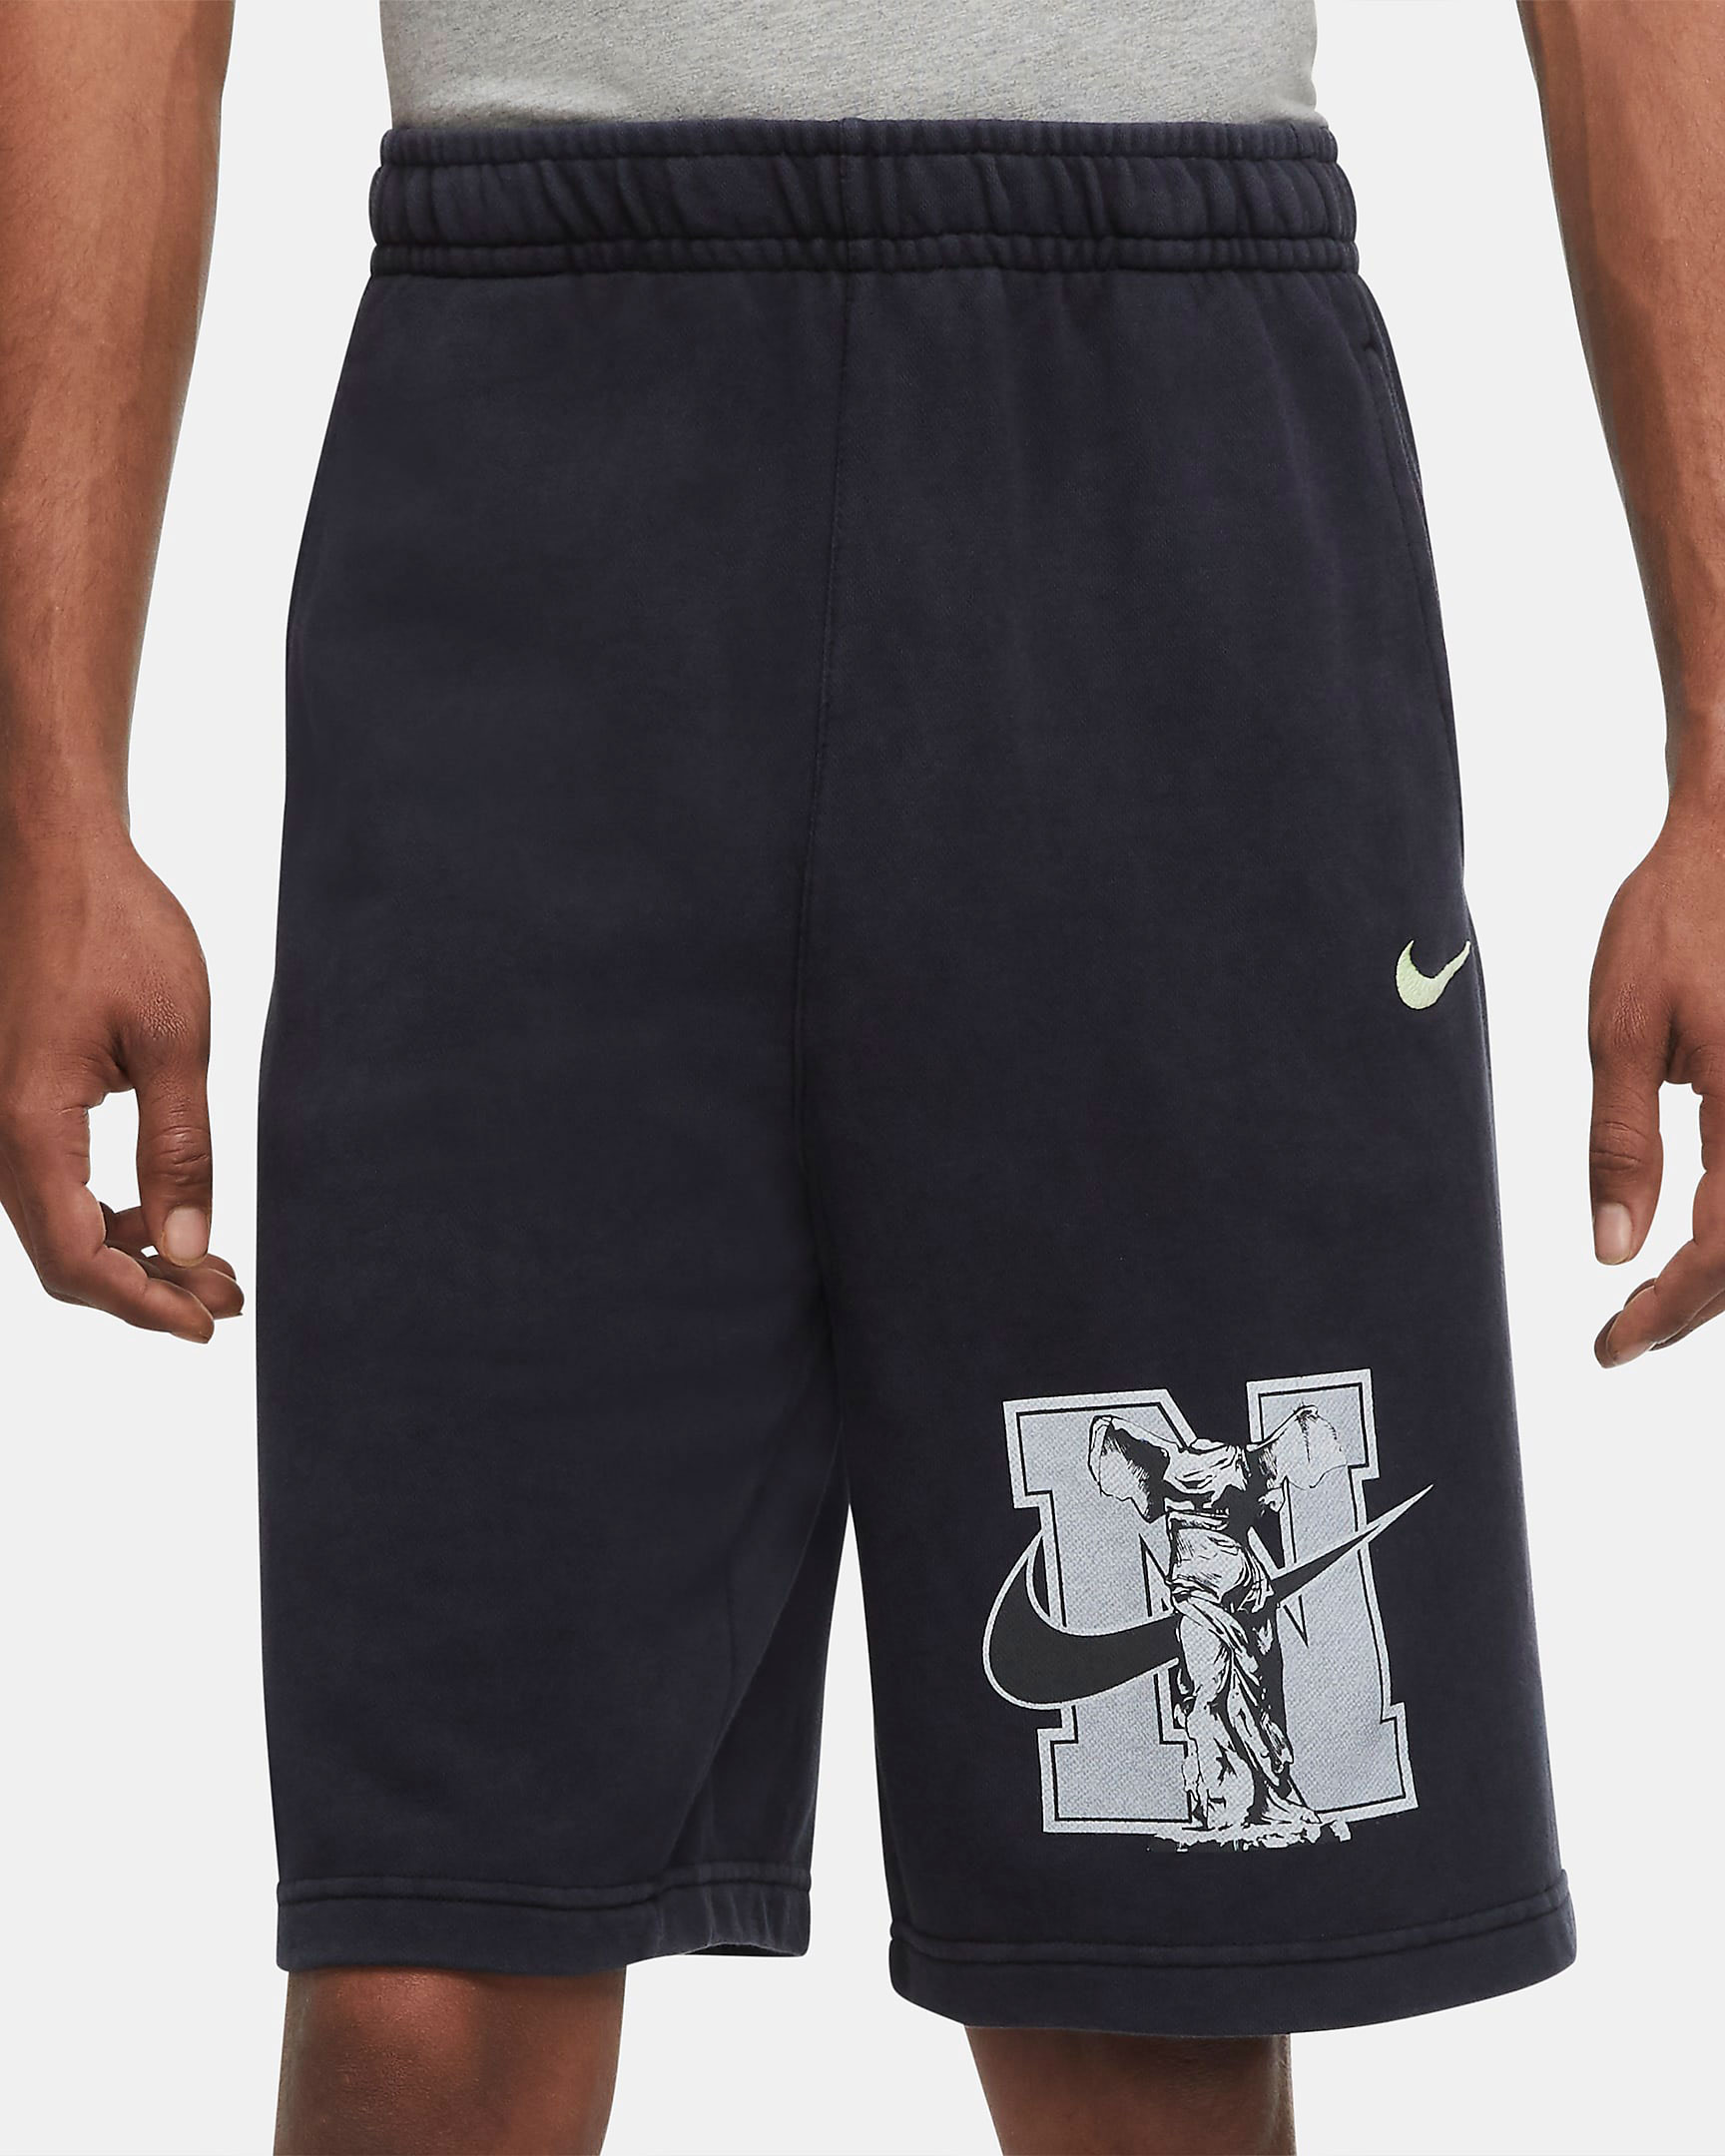 nike-air-max-95-neon-2020-shorts-1